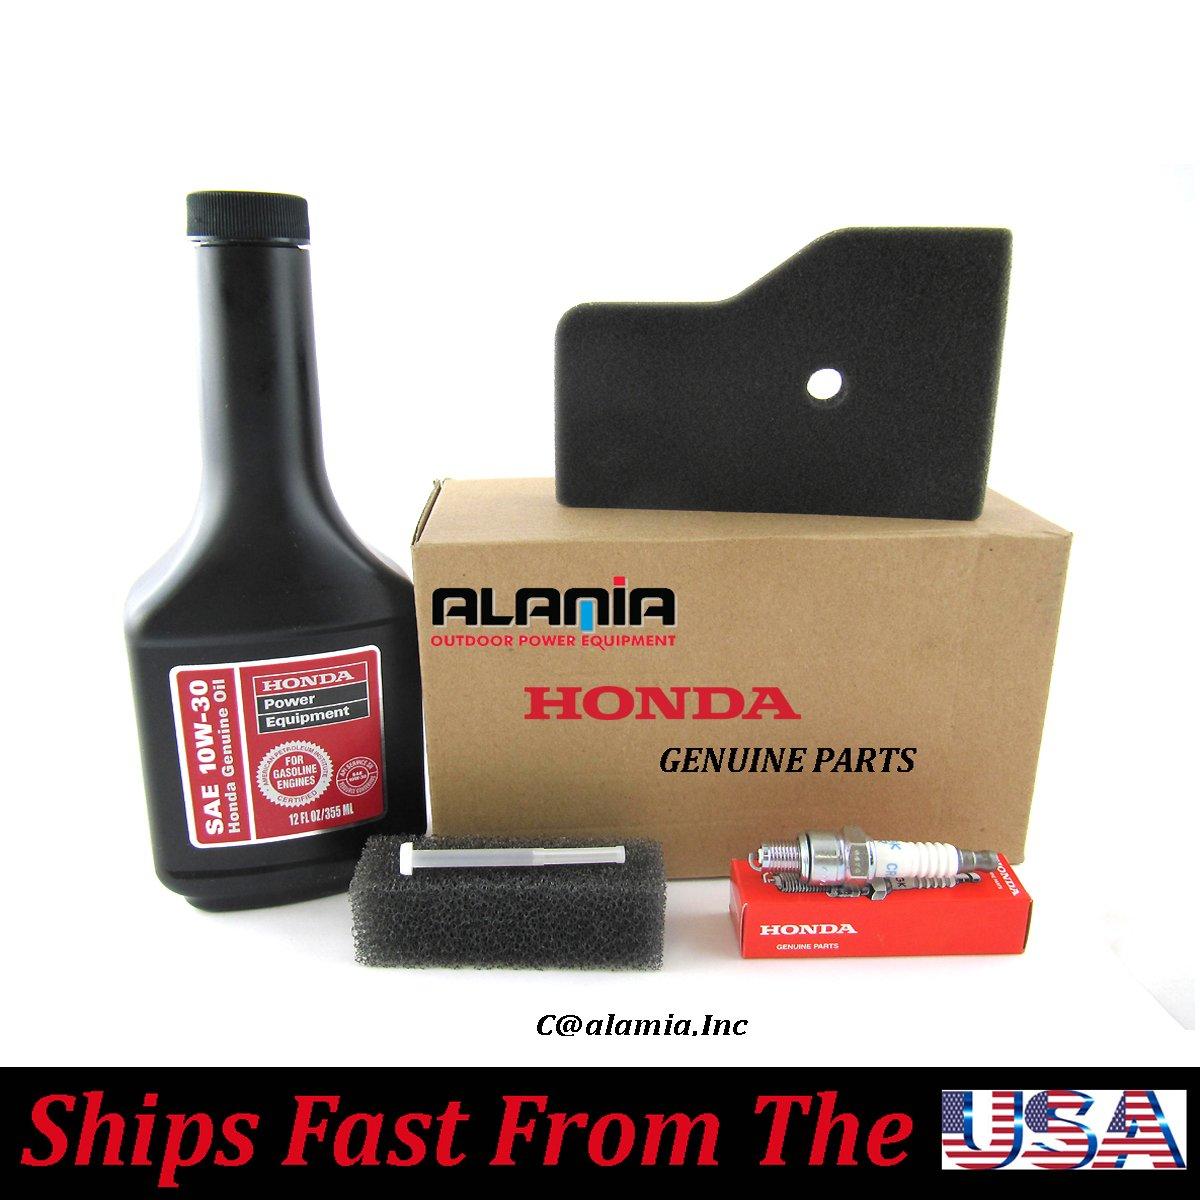 Alamia Inc Genuine Honda Eu2000i Generator Maintenance Tune Up Fuel Filters Kit Oil Spark Plug Filter